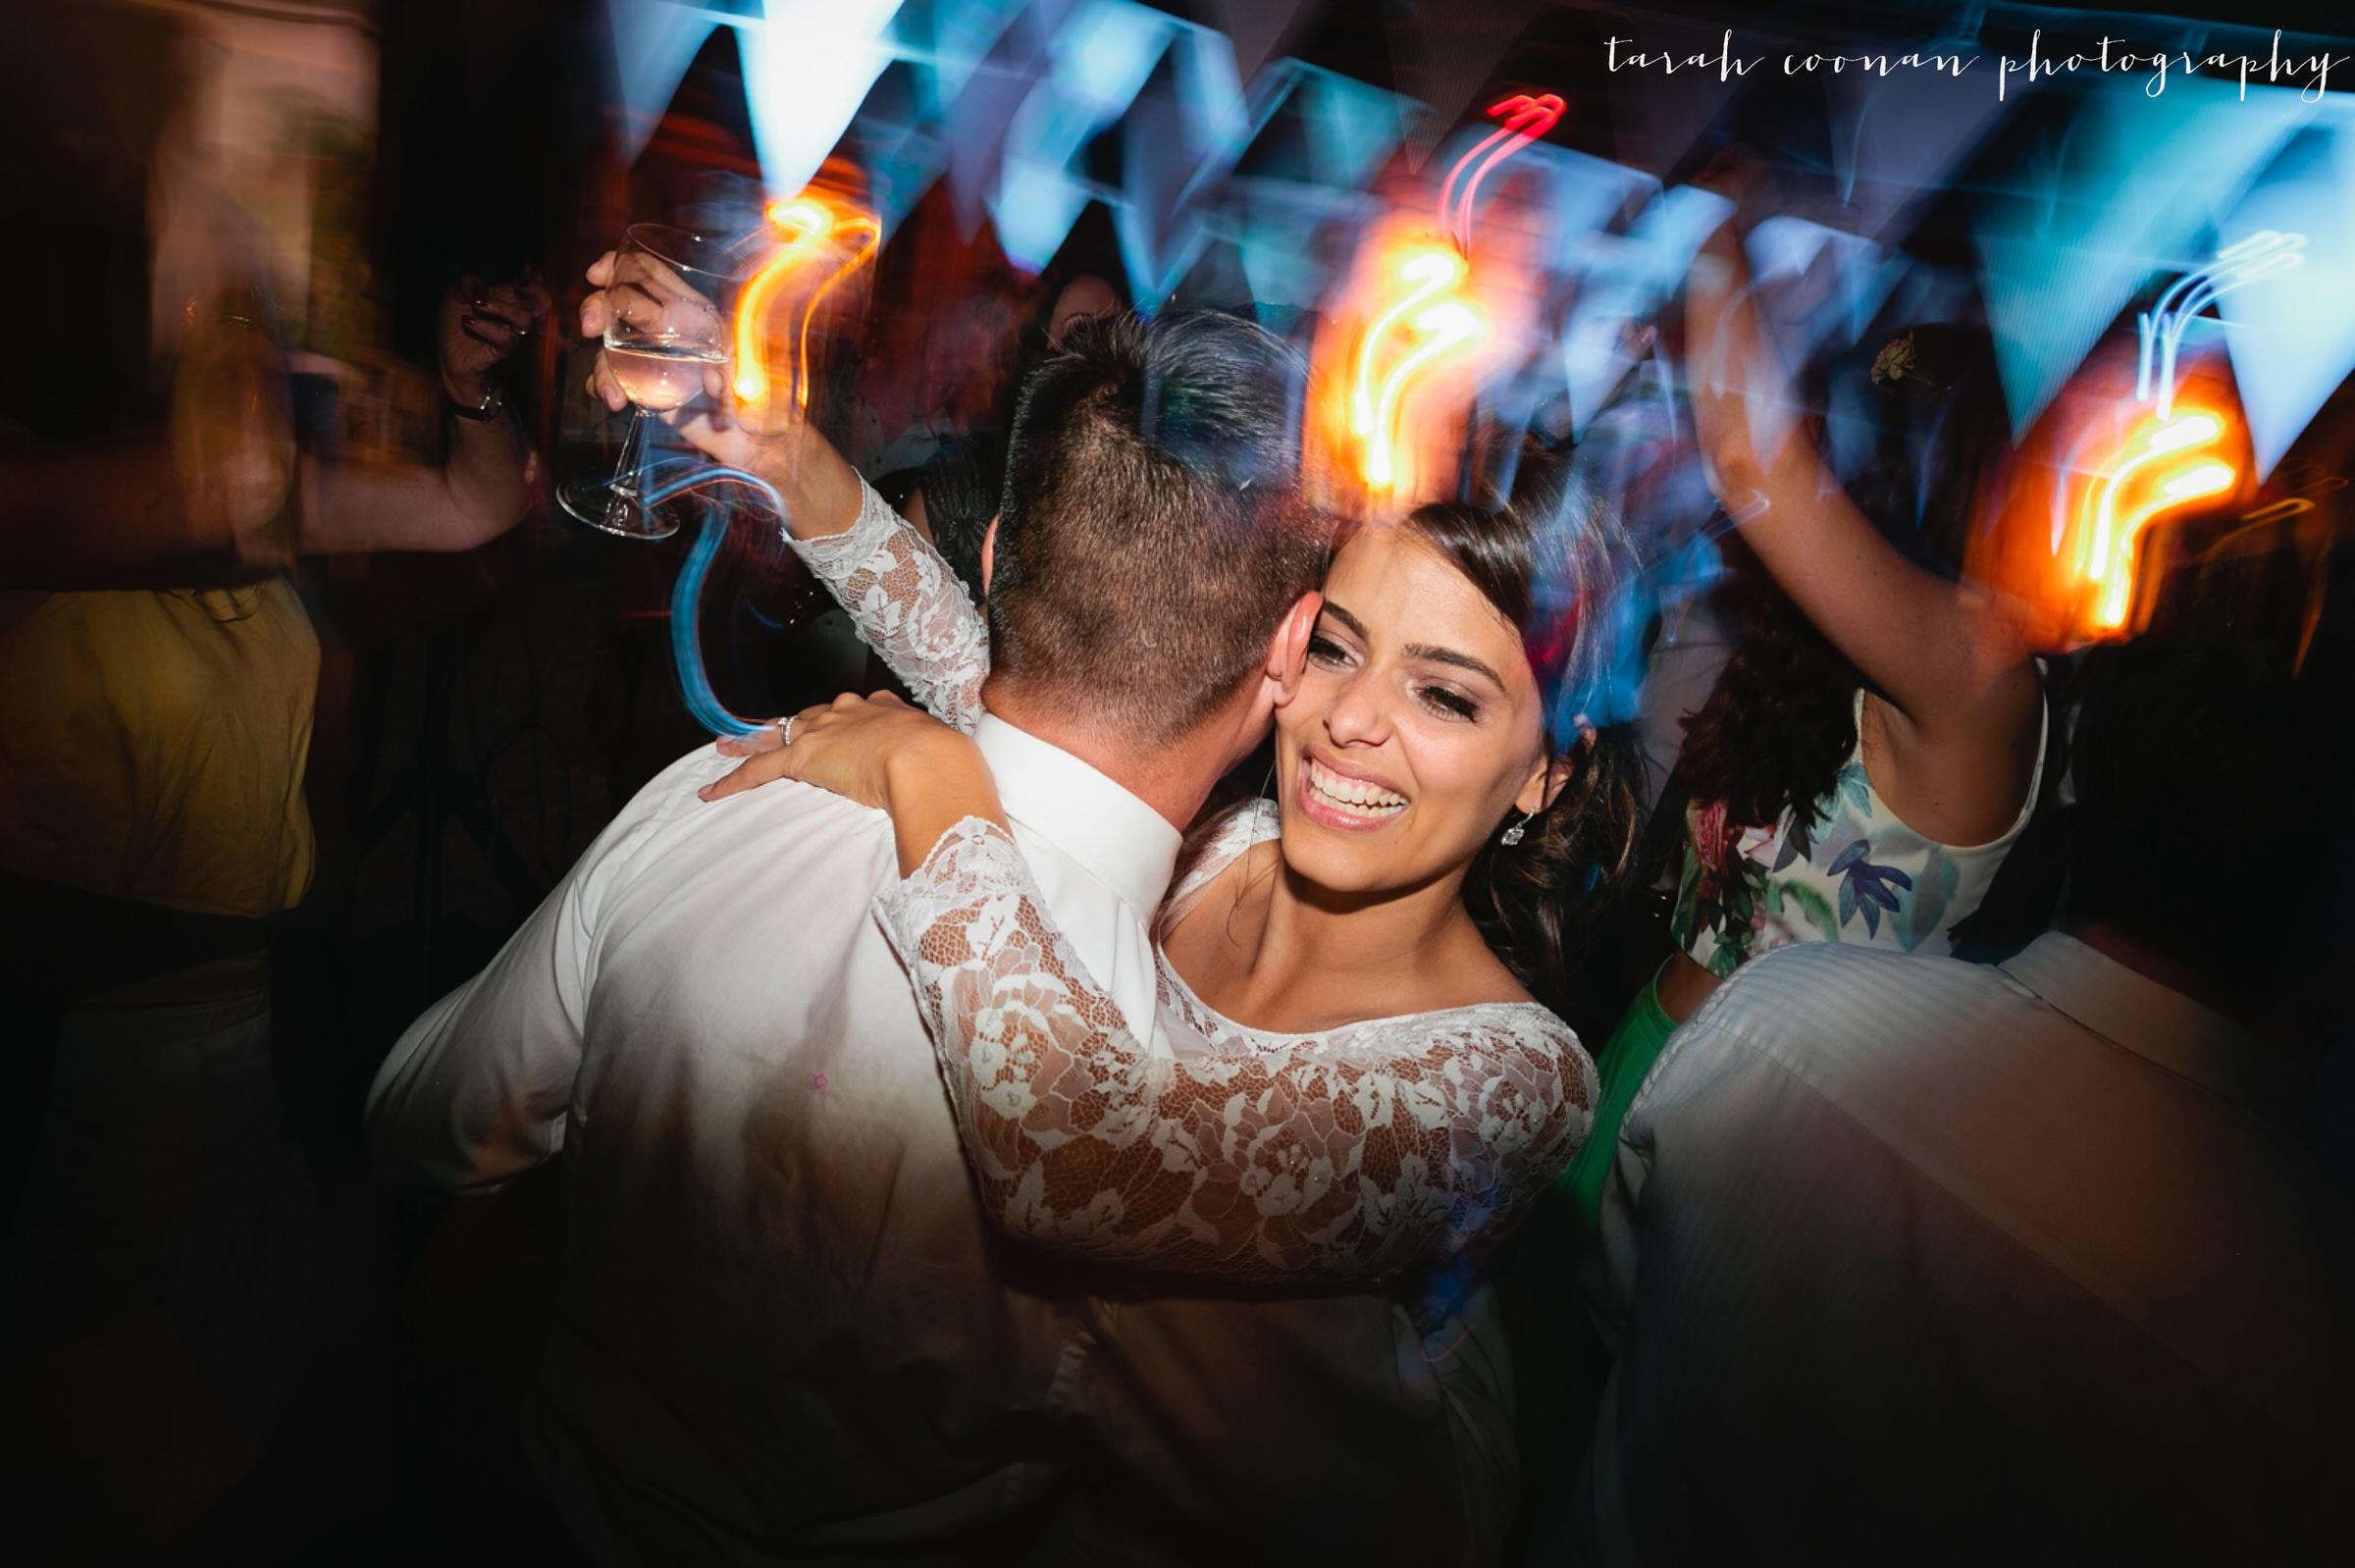 brighton-wedding-photographer124